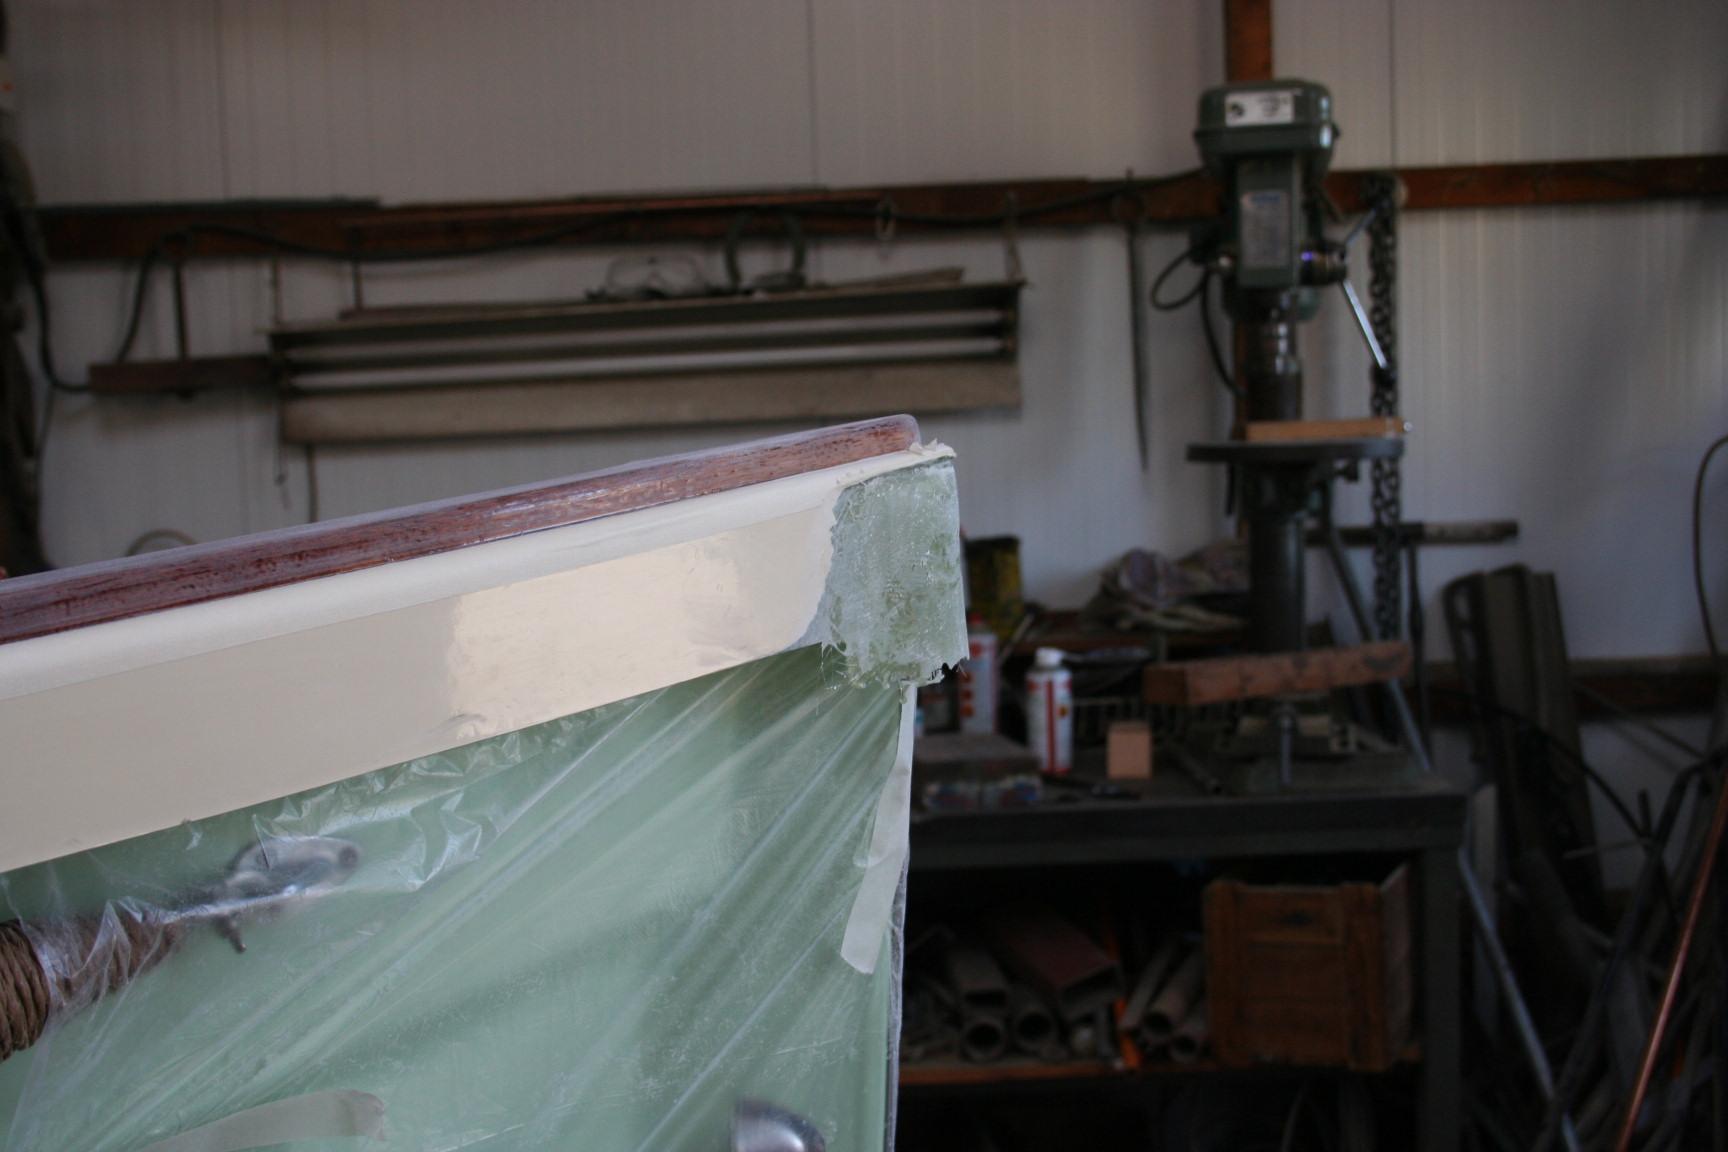 Boeg schade reparatie Kuperus Sloep in Workum